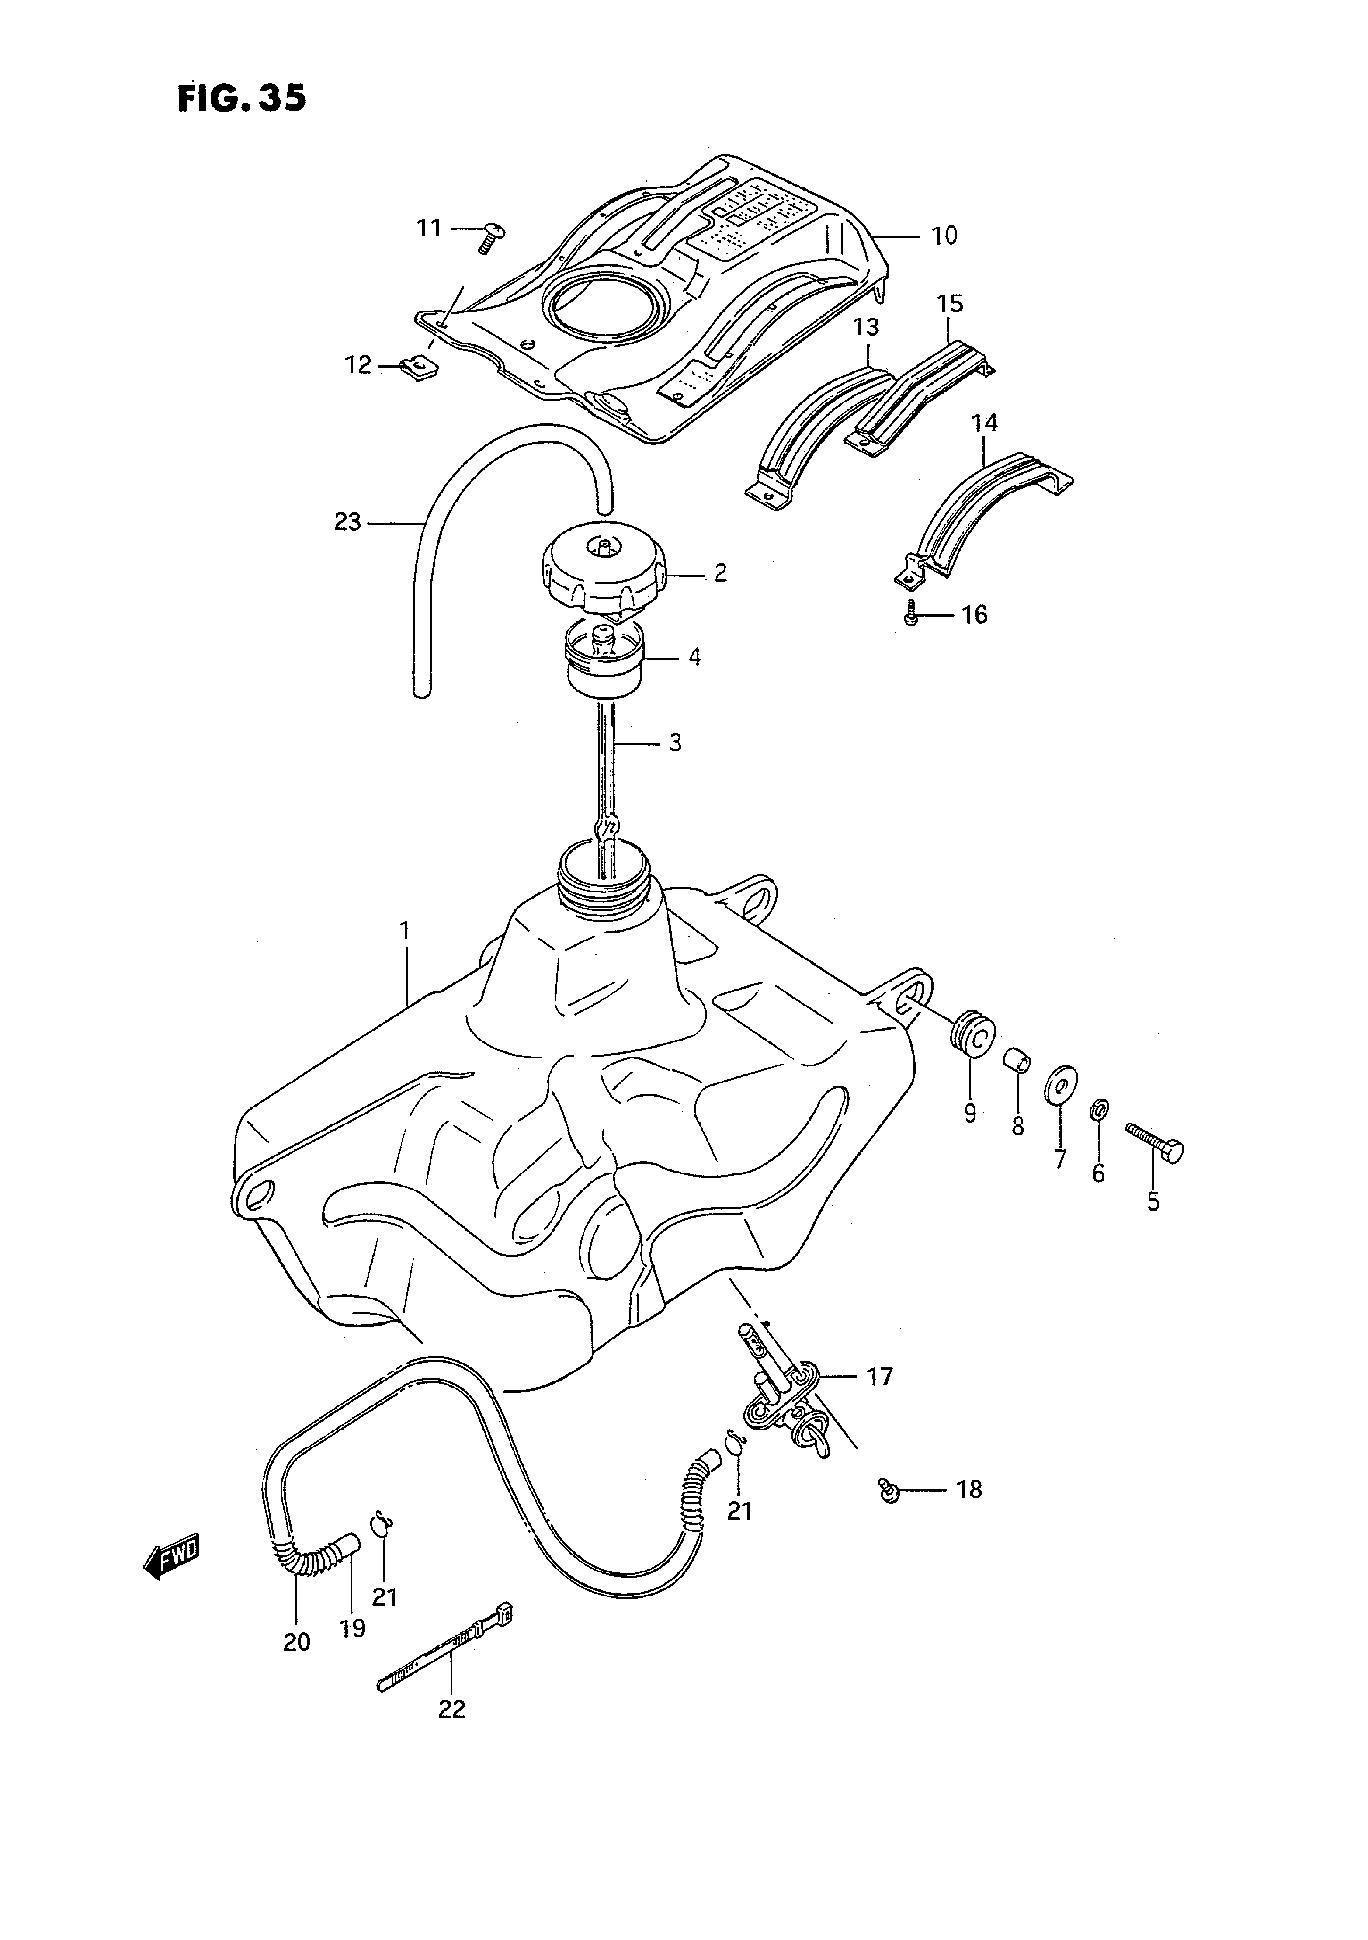 Aw 4581 Diagram Additionally Chinese Quad 110cc Atv Wiring Diagram Besides Car Free Diagram